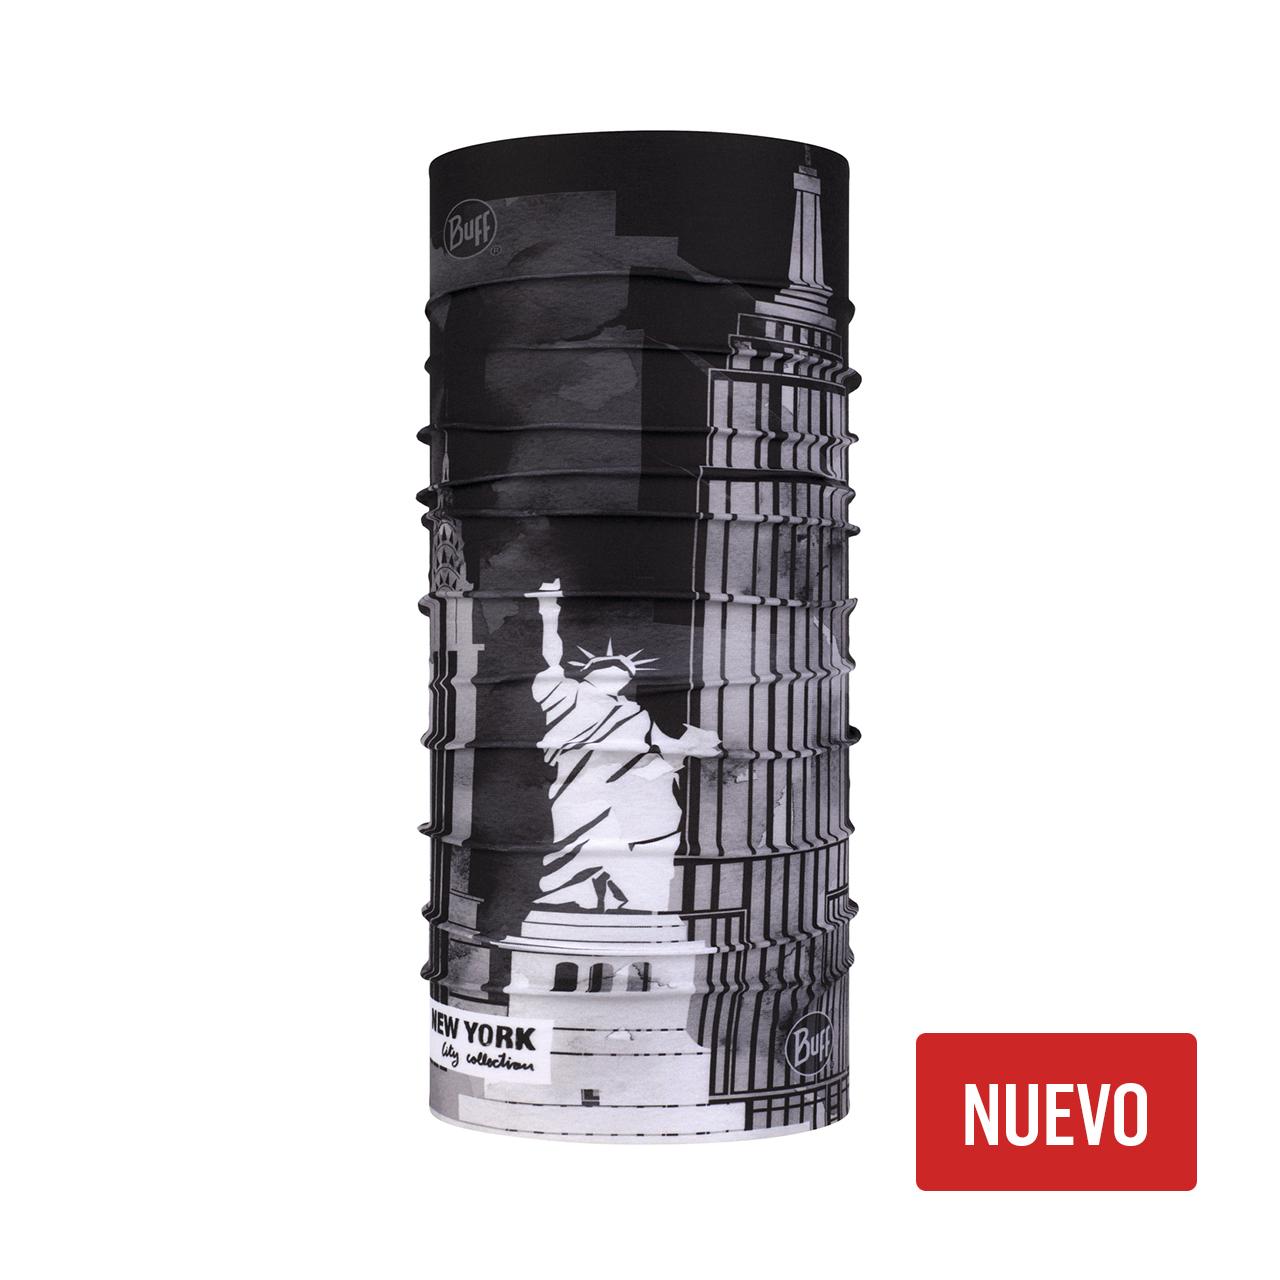 BUFF ORIGINAL CITY COLLECTION NEWYORK-BLACK